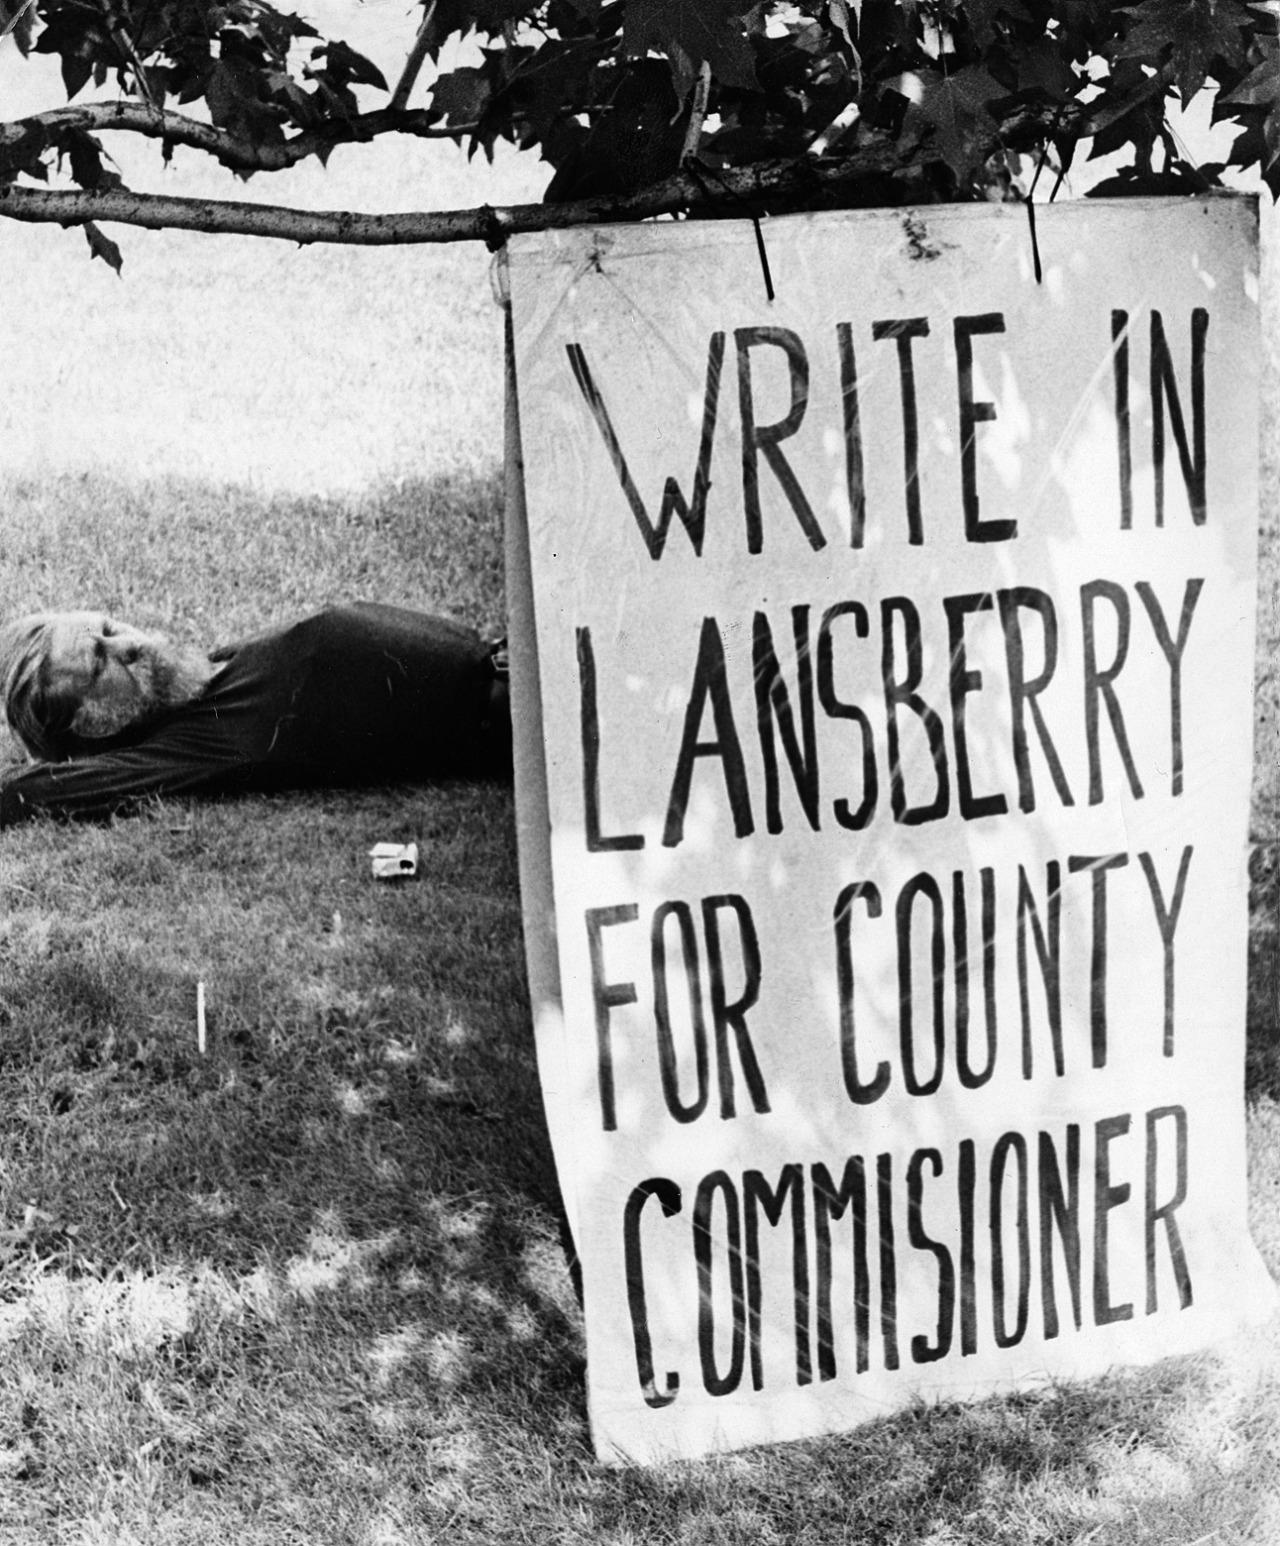 Robert Lansberry, Aug. 1979 (Paul Slantis, Post-Gazette)